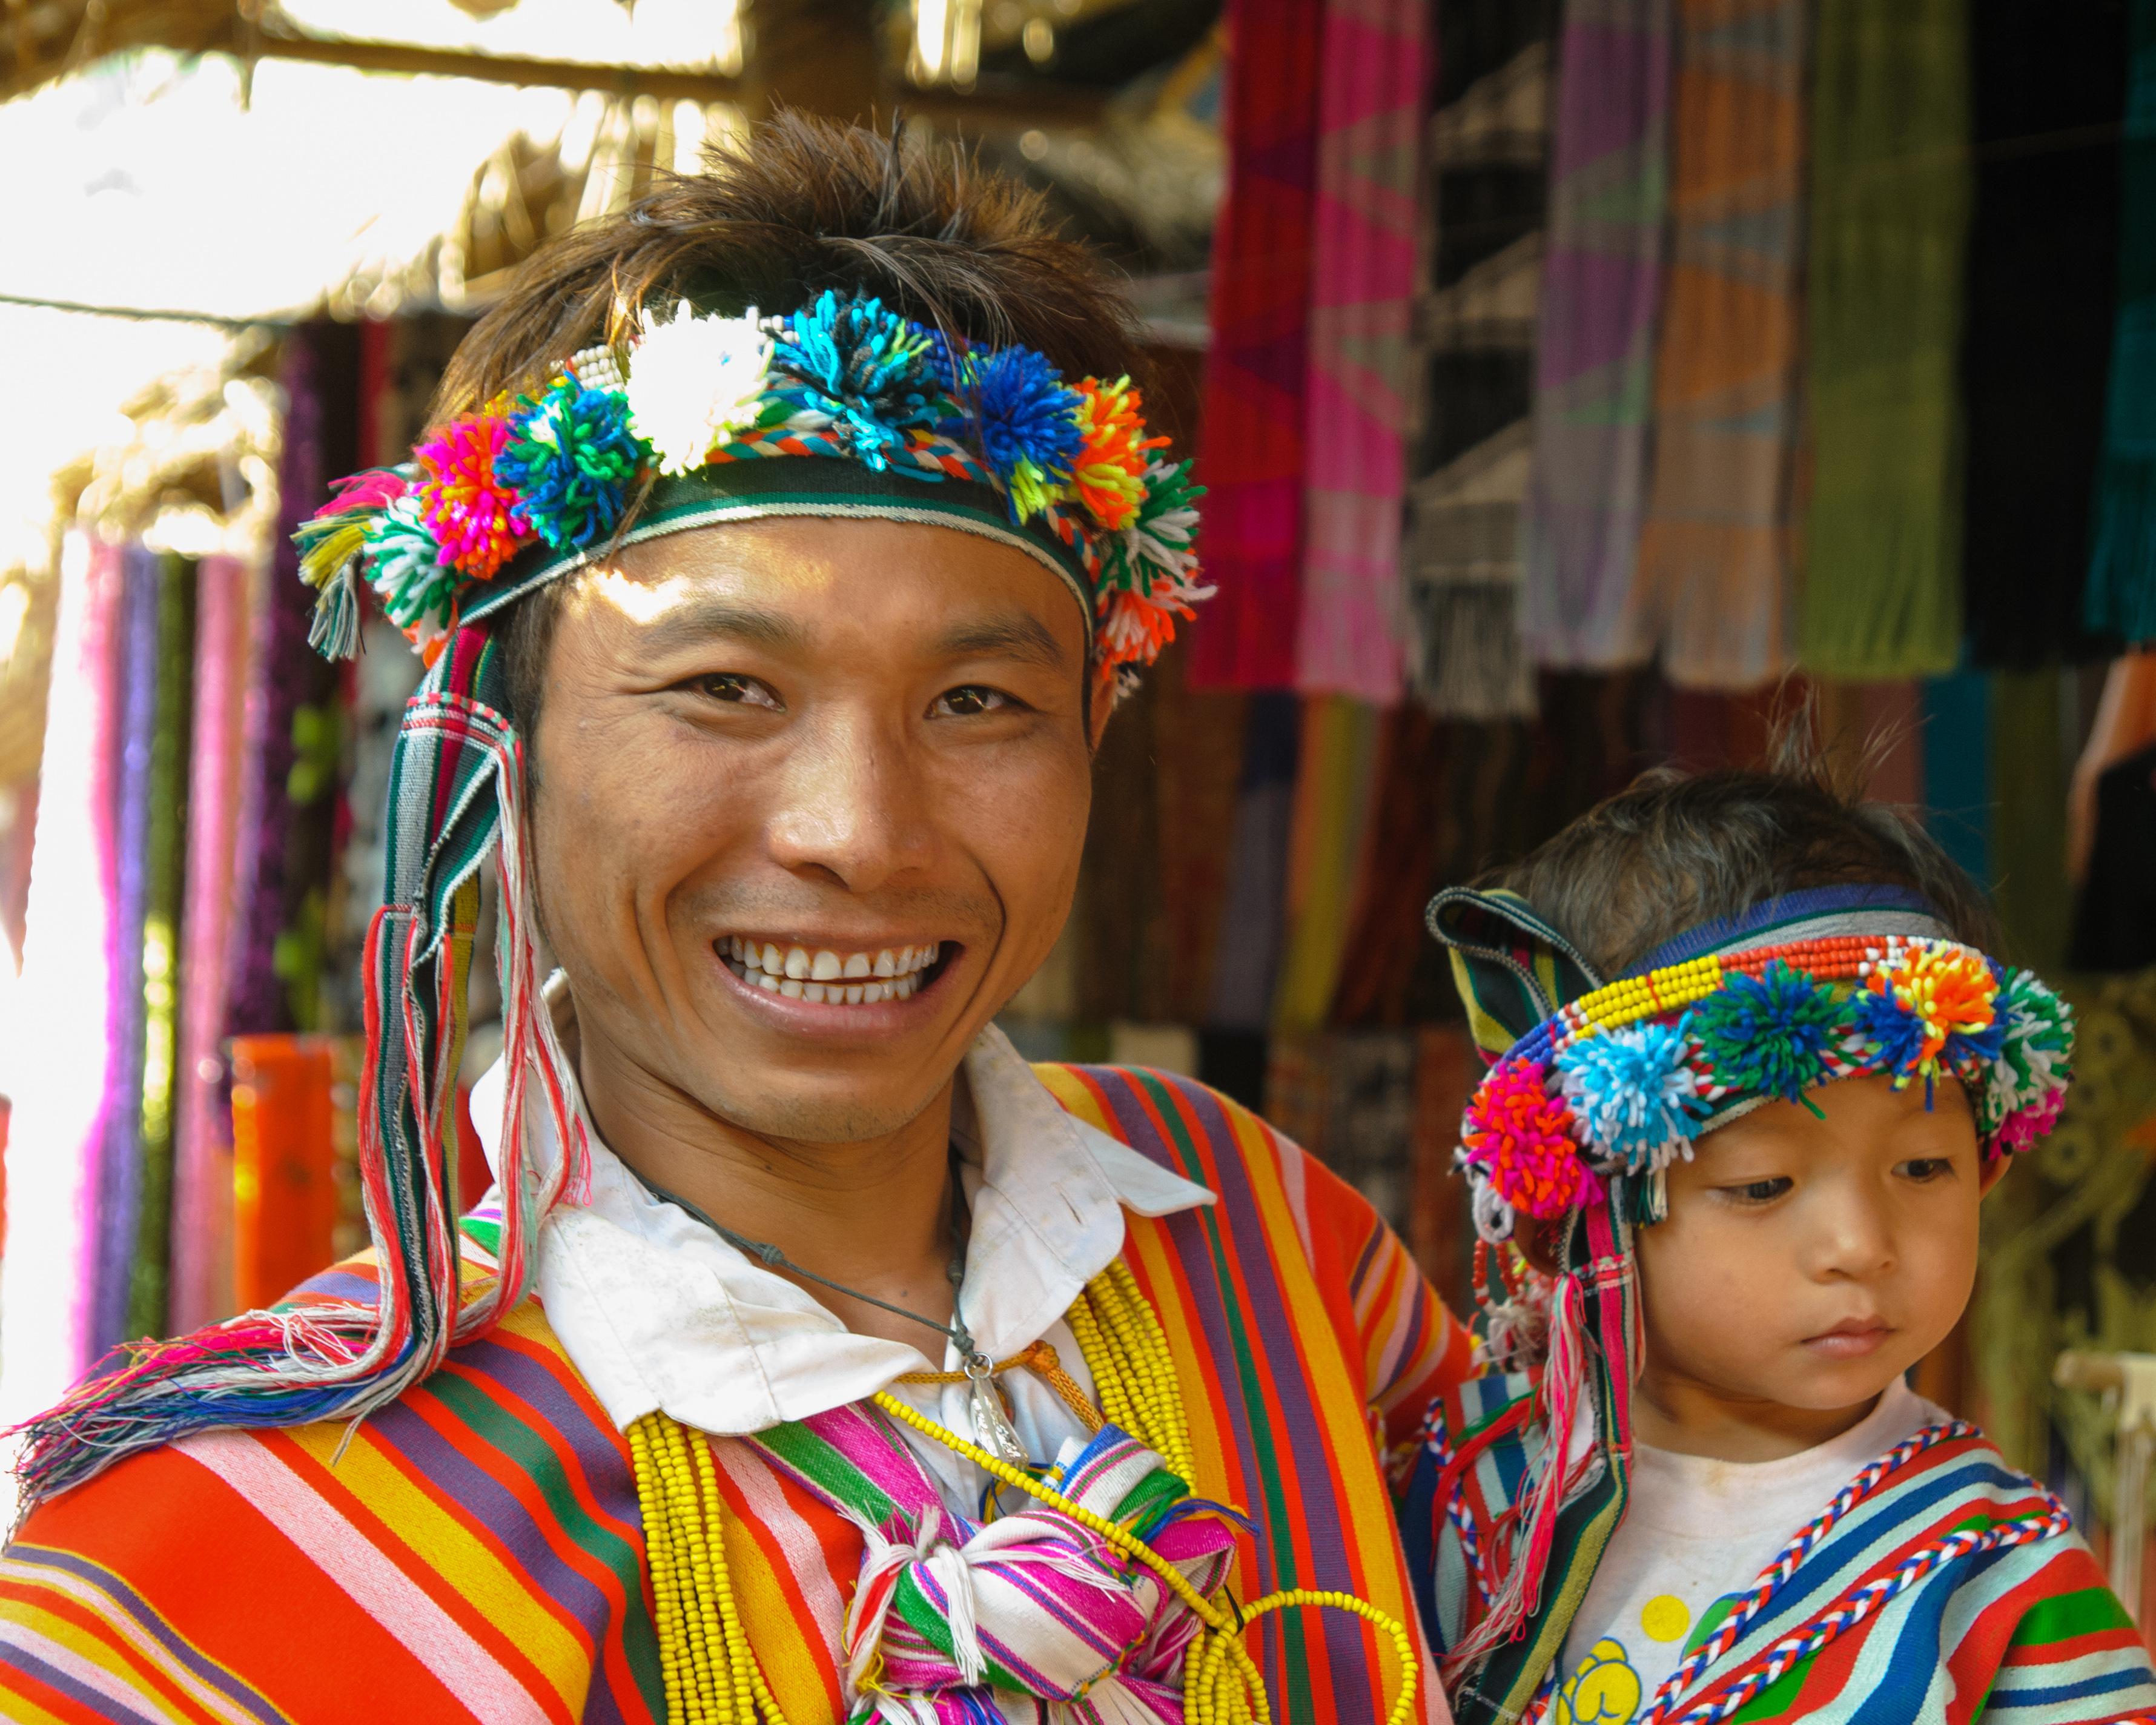 tailandia tribe tradition portrait thailandia thailand dance event carnival nikon nikond300 d300 chiangmai festival person pxhere domain